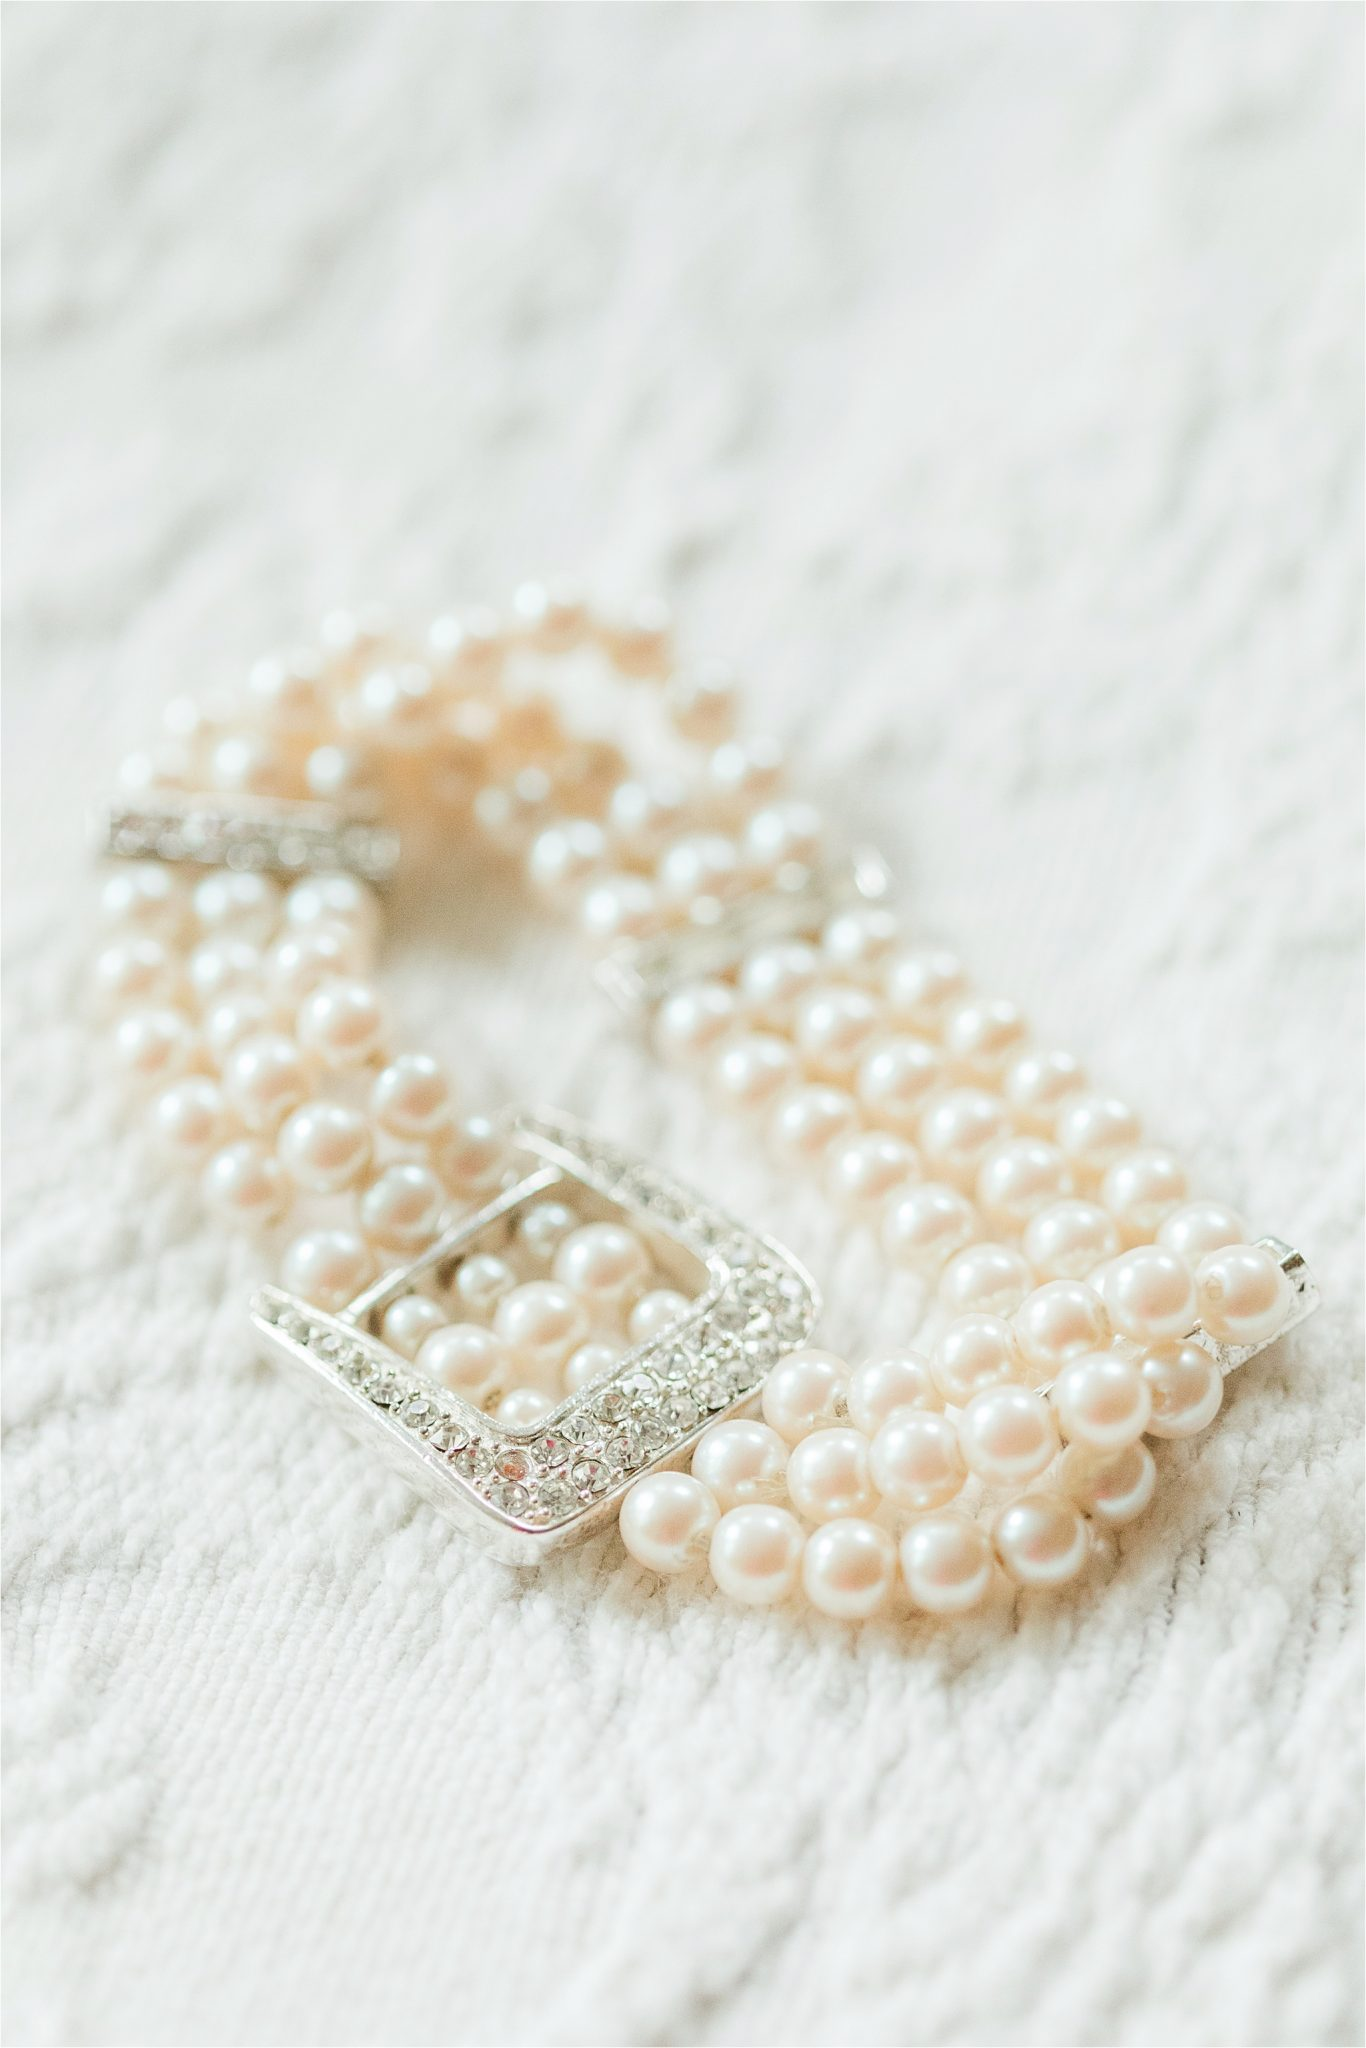 Pearl bridal jewelry-pearls and diamonds-bracelet-wedding jewelry-bridal details